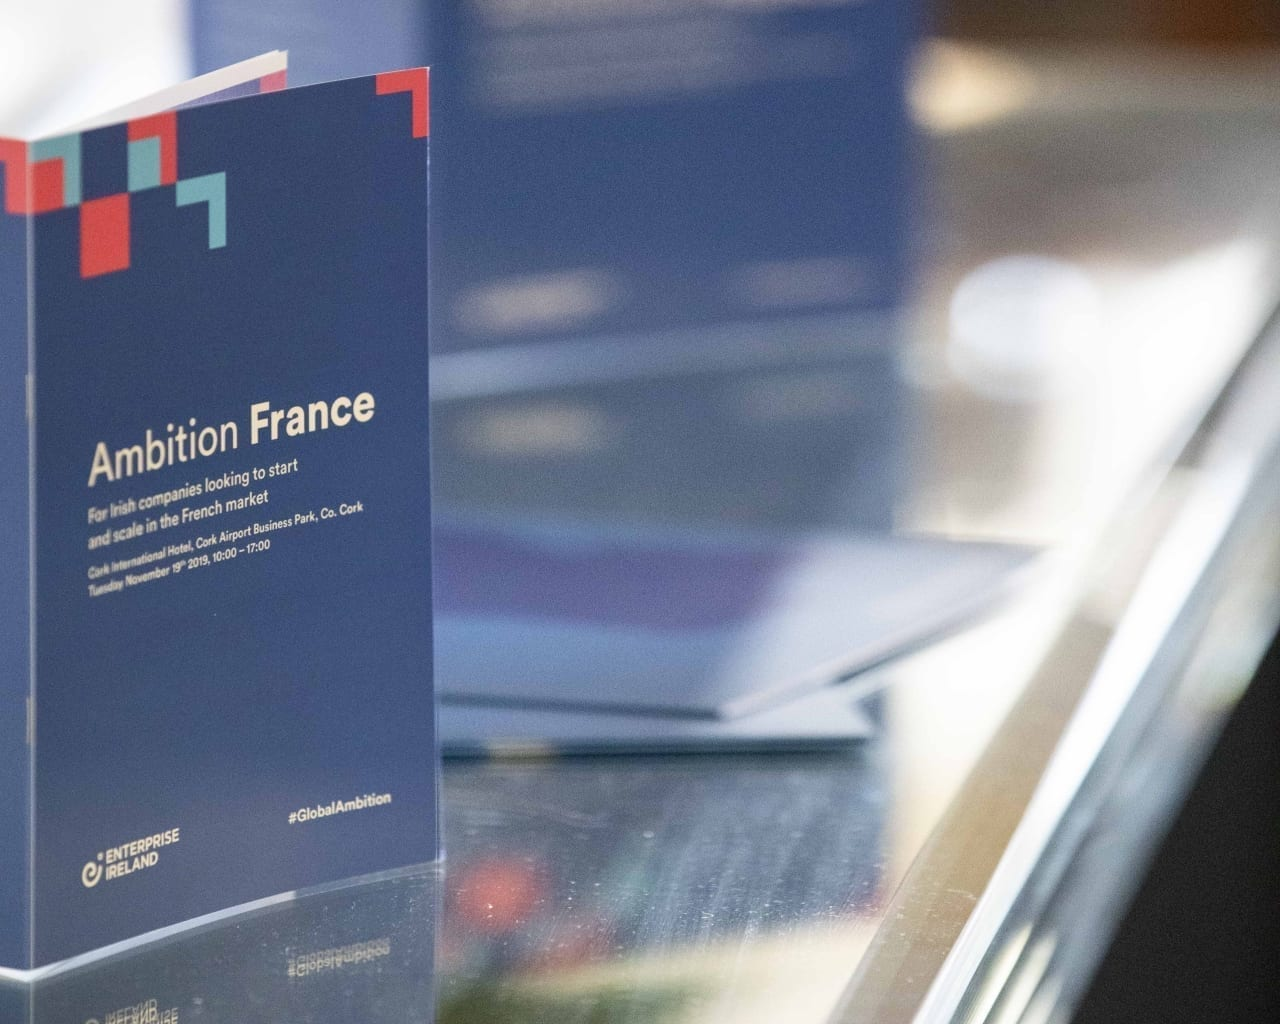 Ambition France brochure